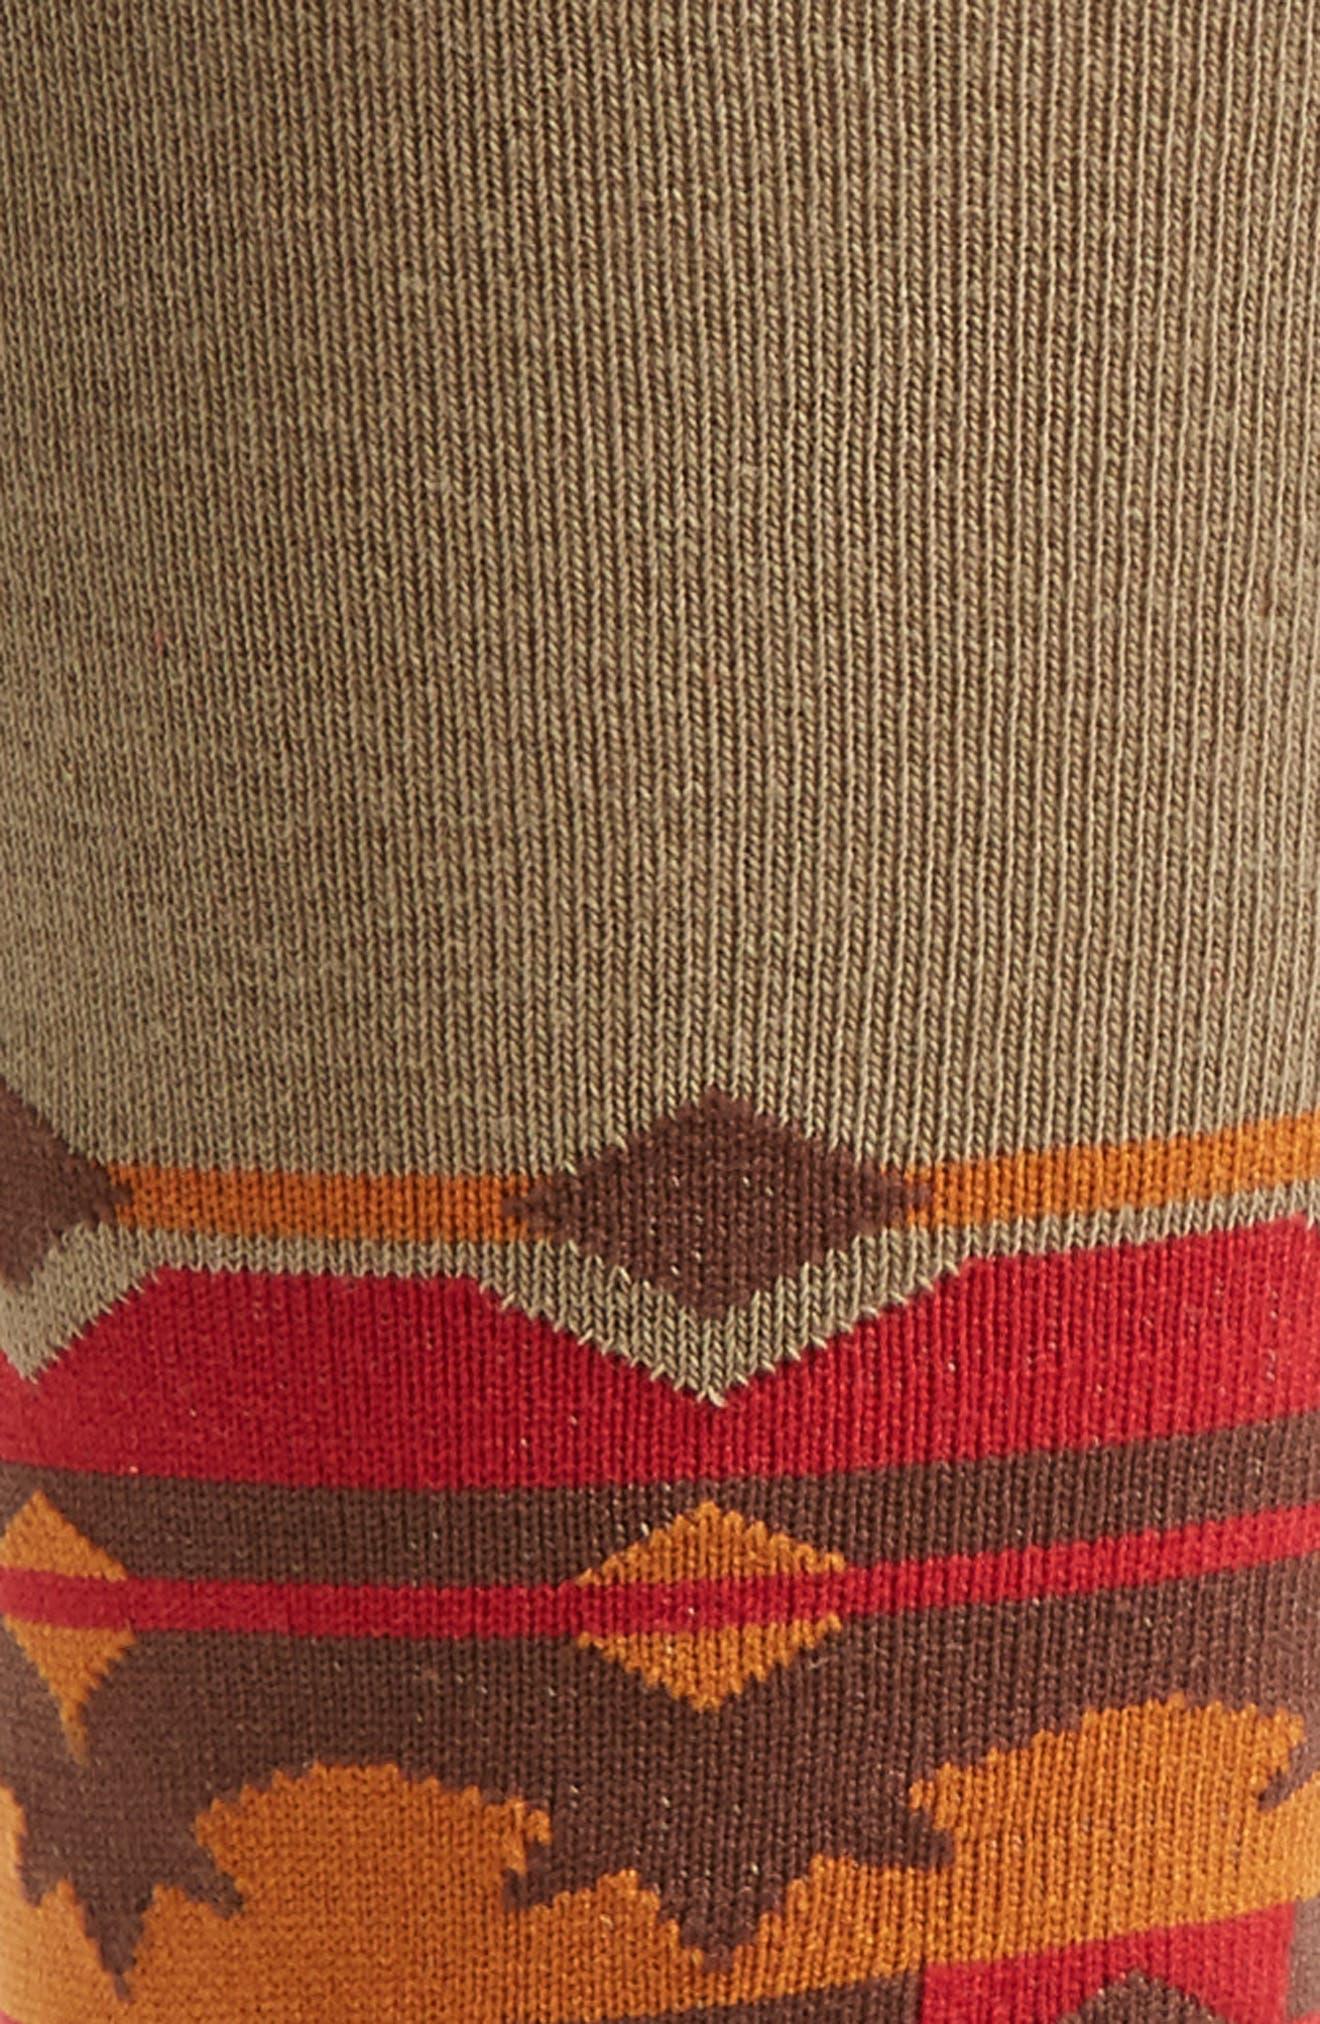 Sinaloa Socks,                             Alternate thumbnail 2, color,                             Red/ Olive